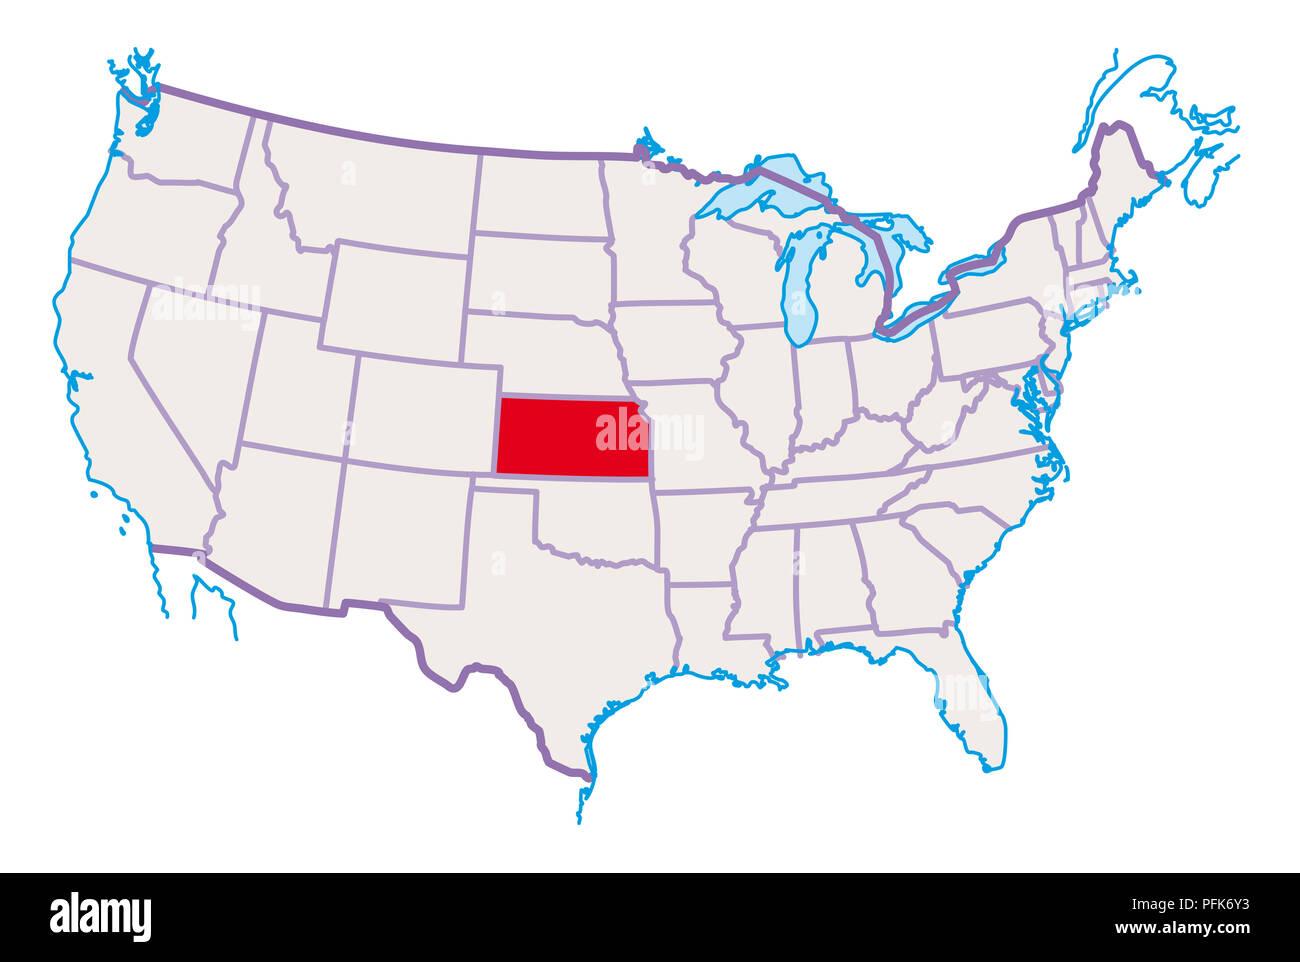 Kansas Map Usa on map of kansas, wabaunsee county kansas, lake wabaunsee kansas, world map kansas, brewster kansas, i-70 toll kansas, fracking map kansas, atchison county kansas, road map kansas, haven kansas, haskell county kansas, detailed map kansas, best of kansas, grainfield kansas, special olympics kansas, brown county kansas, names of towns in kansas, joy land amusement park kansas, interstate 70 kansas,